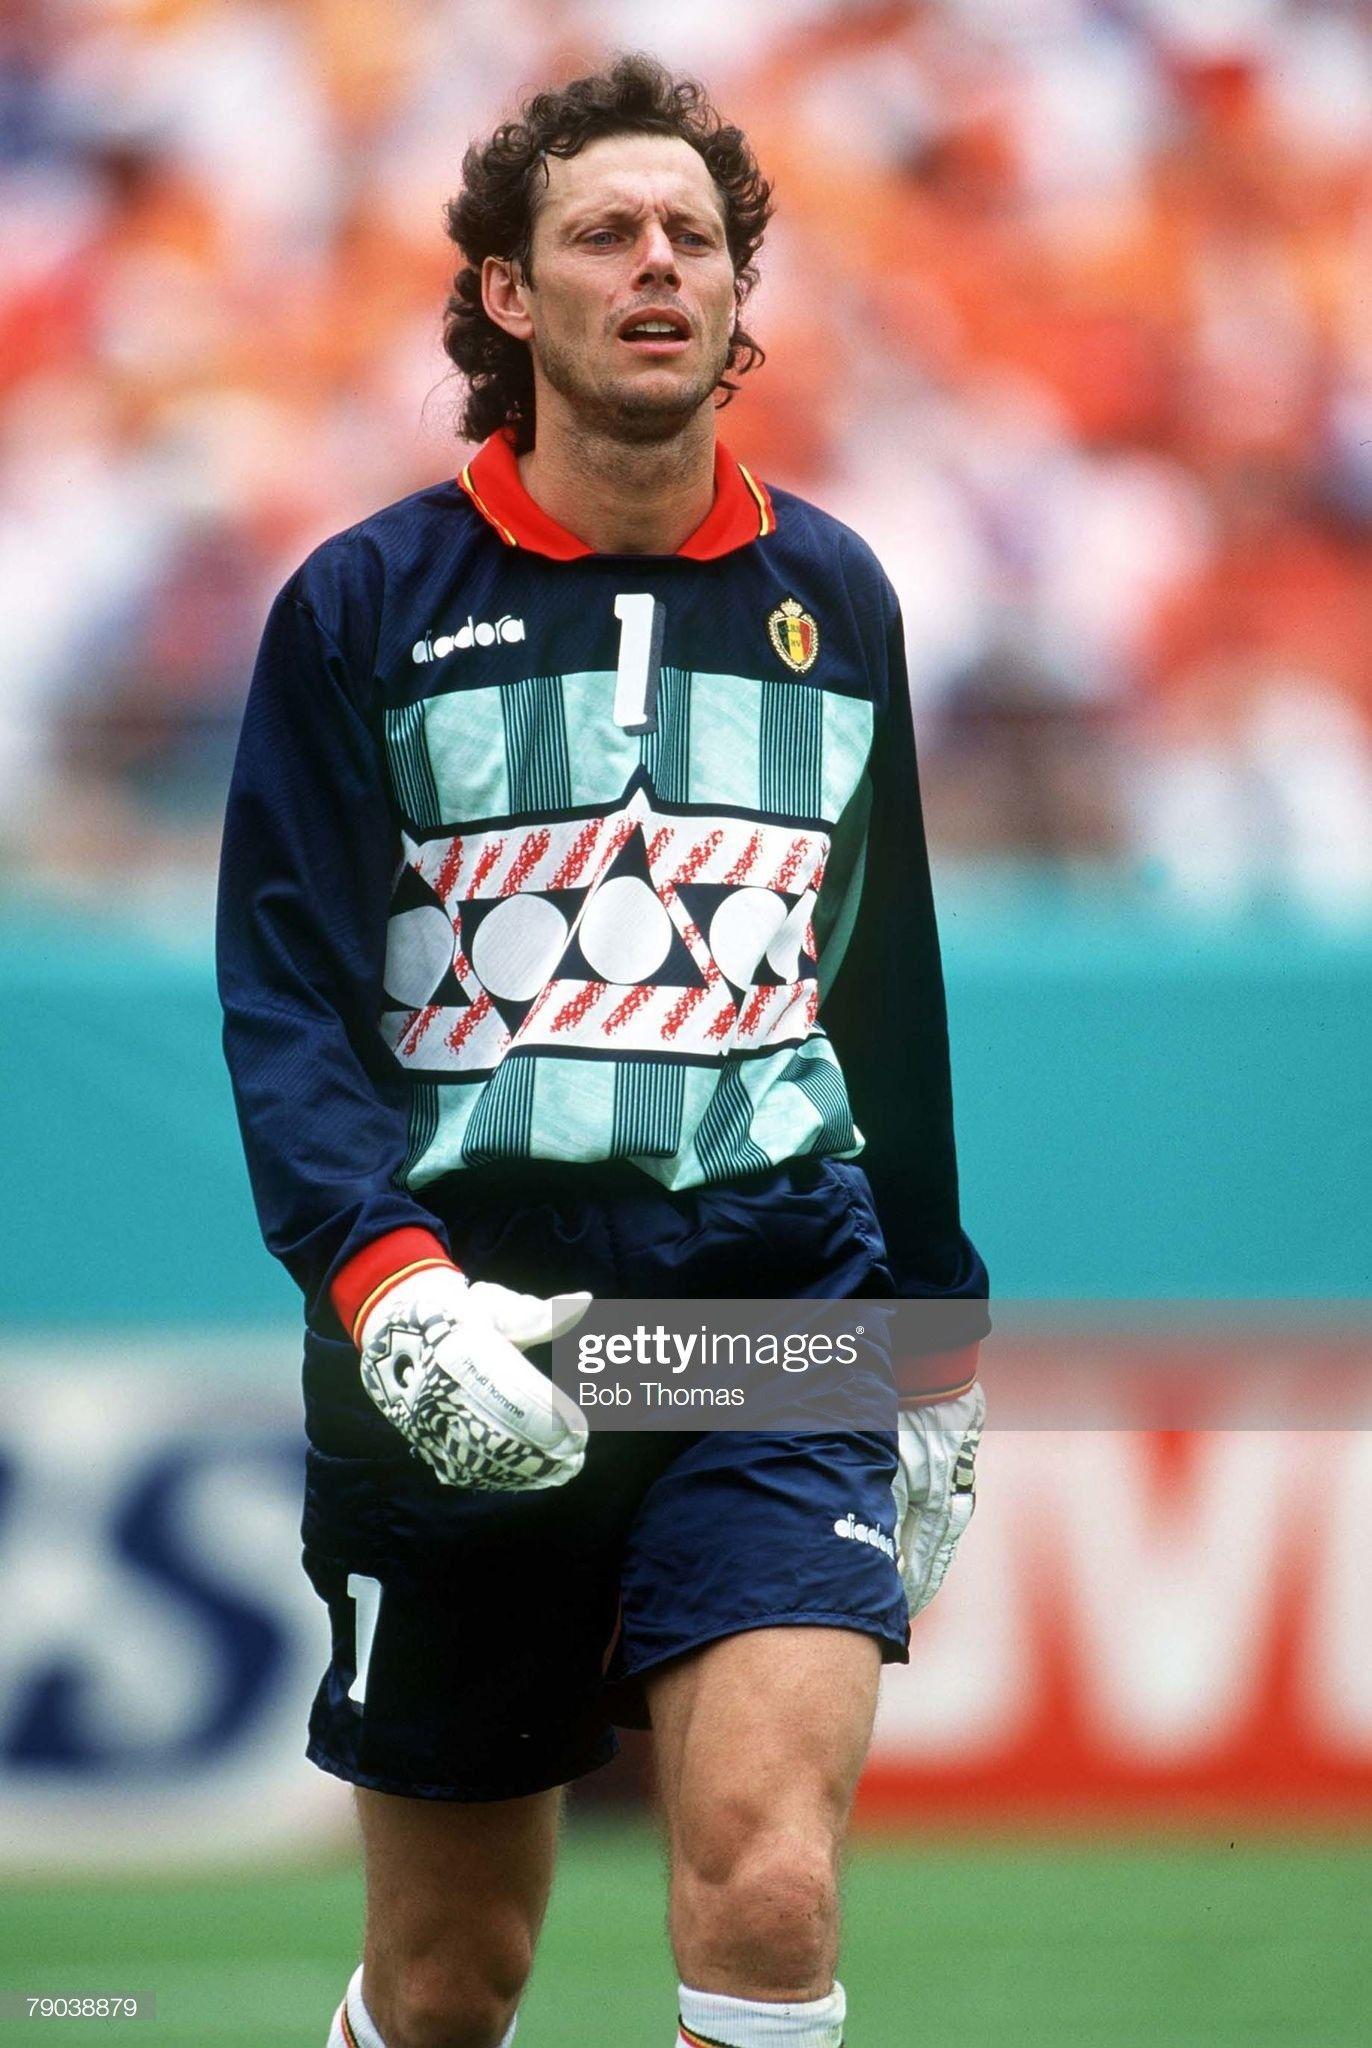 1. Michel Preud'Homme Bélgica (Copa do Mundo 1994